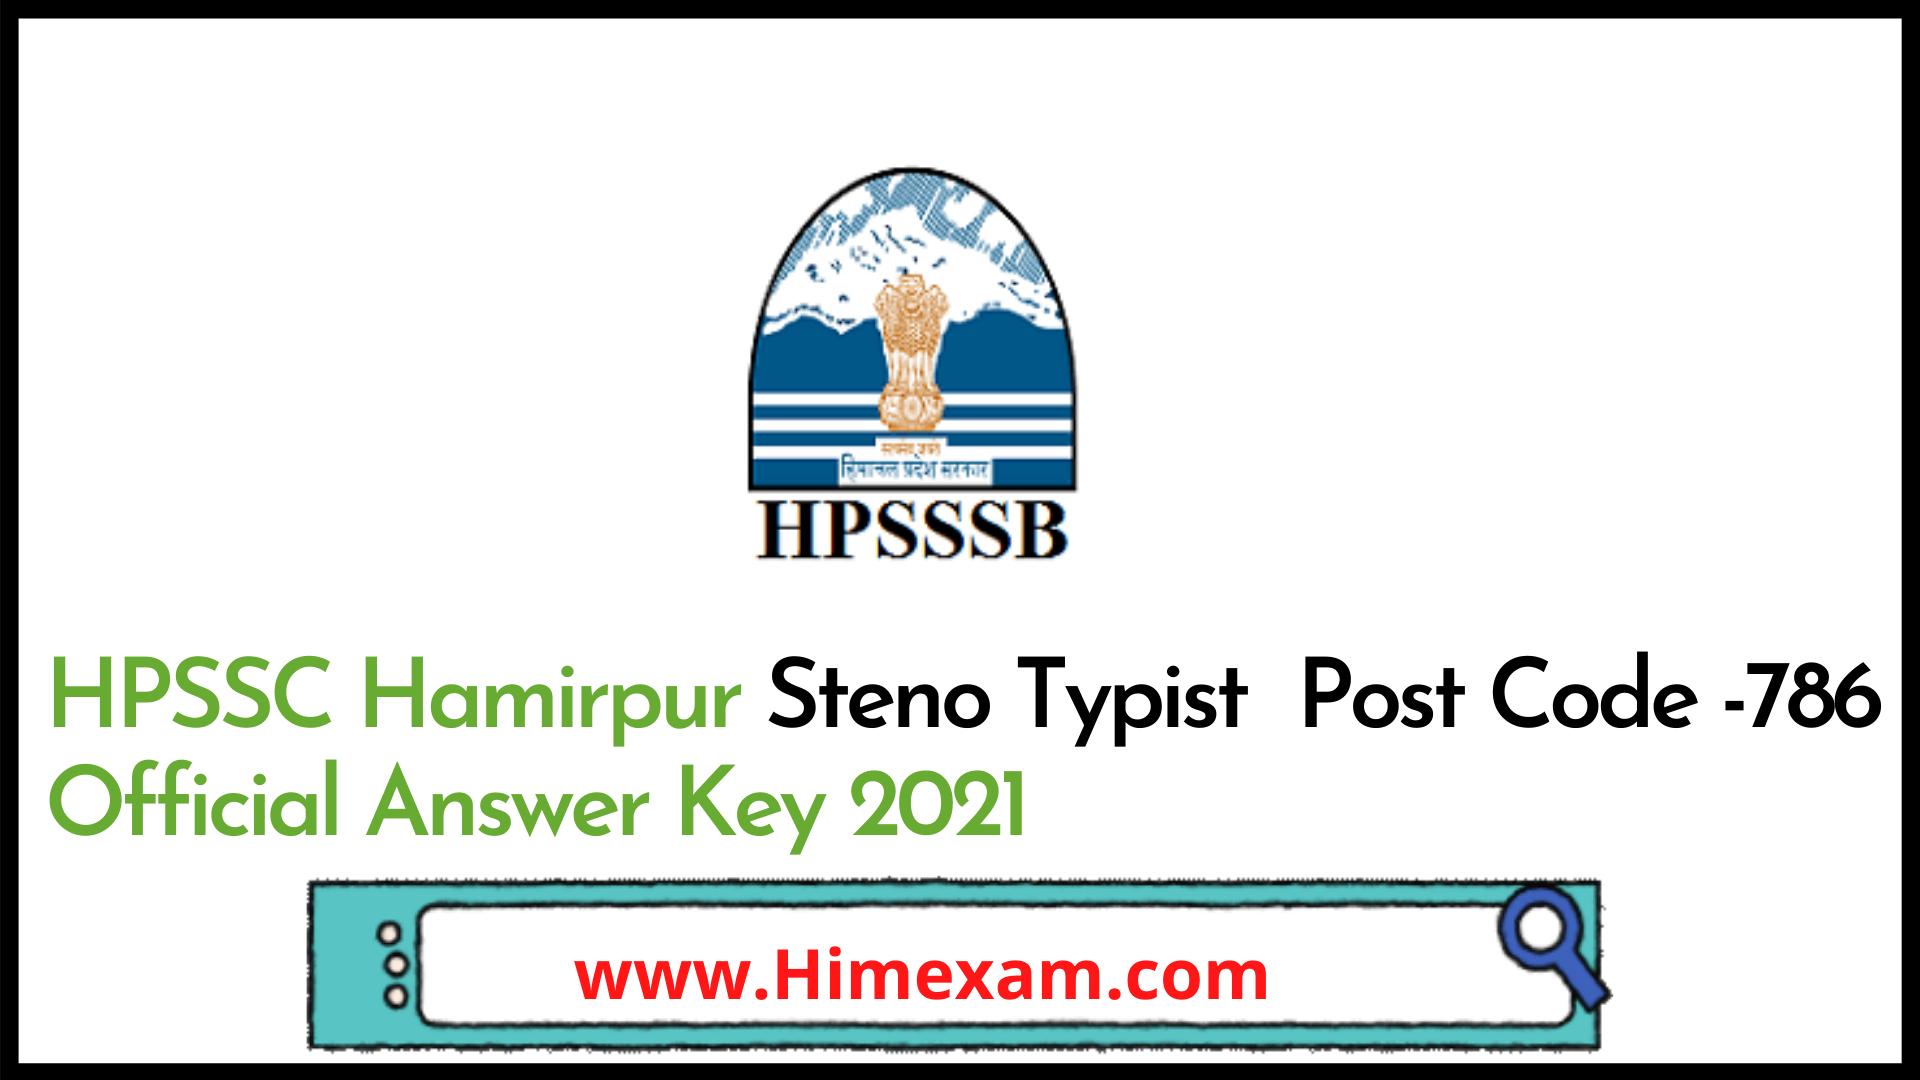 HPSSC Hamirpur Steno Typist  Post Code -786 Official Answer Key 2021